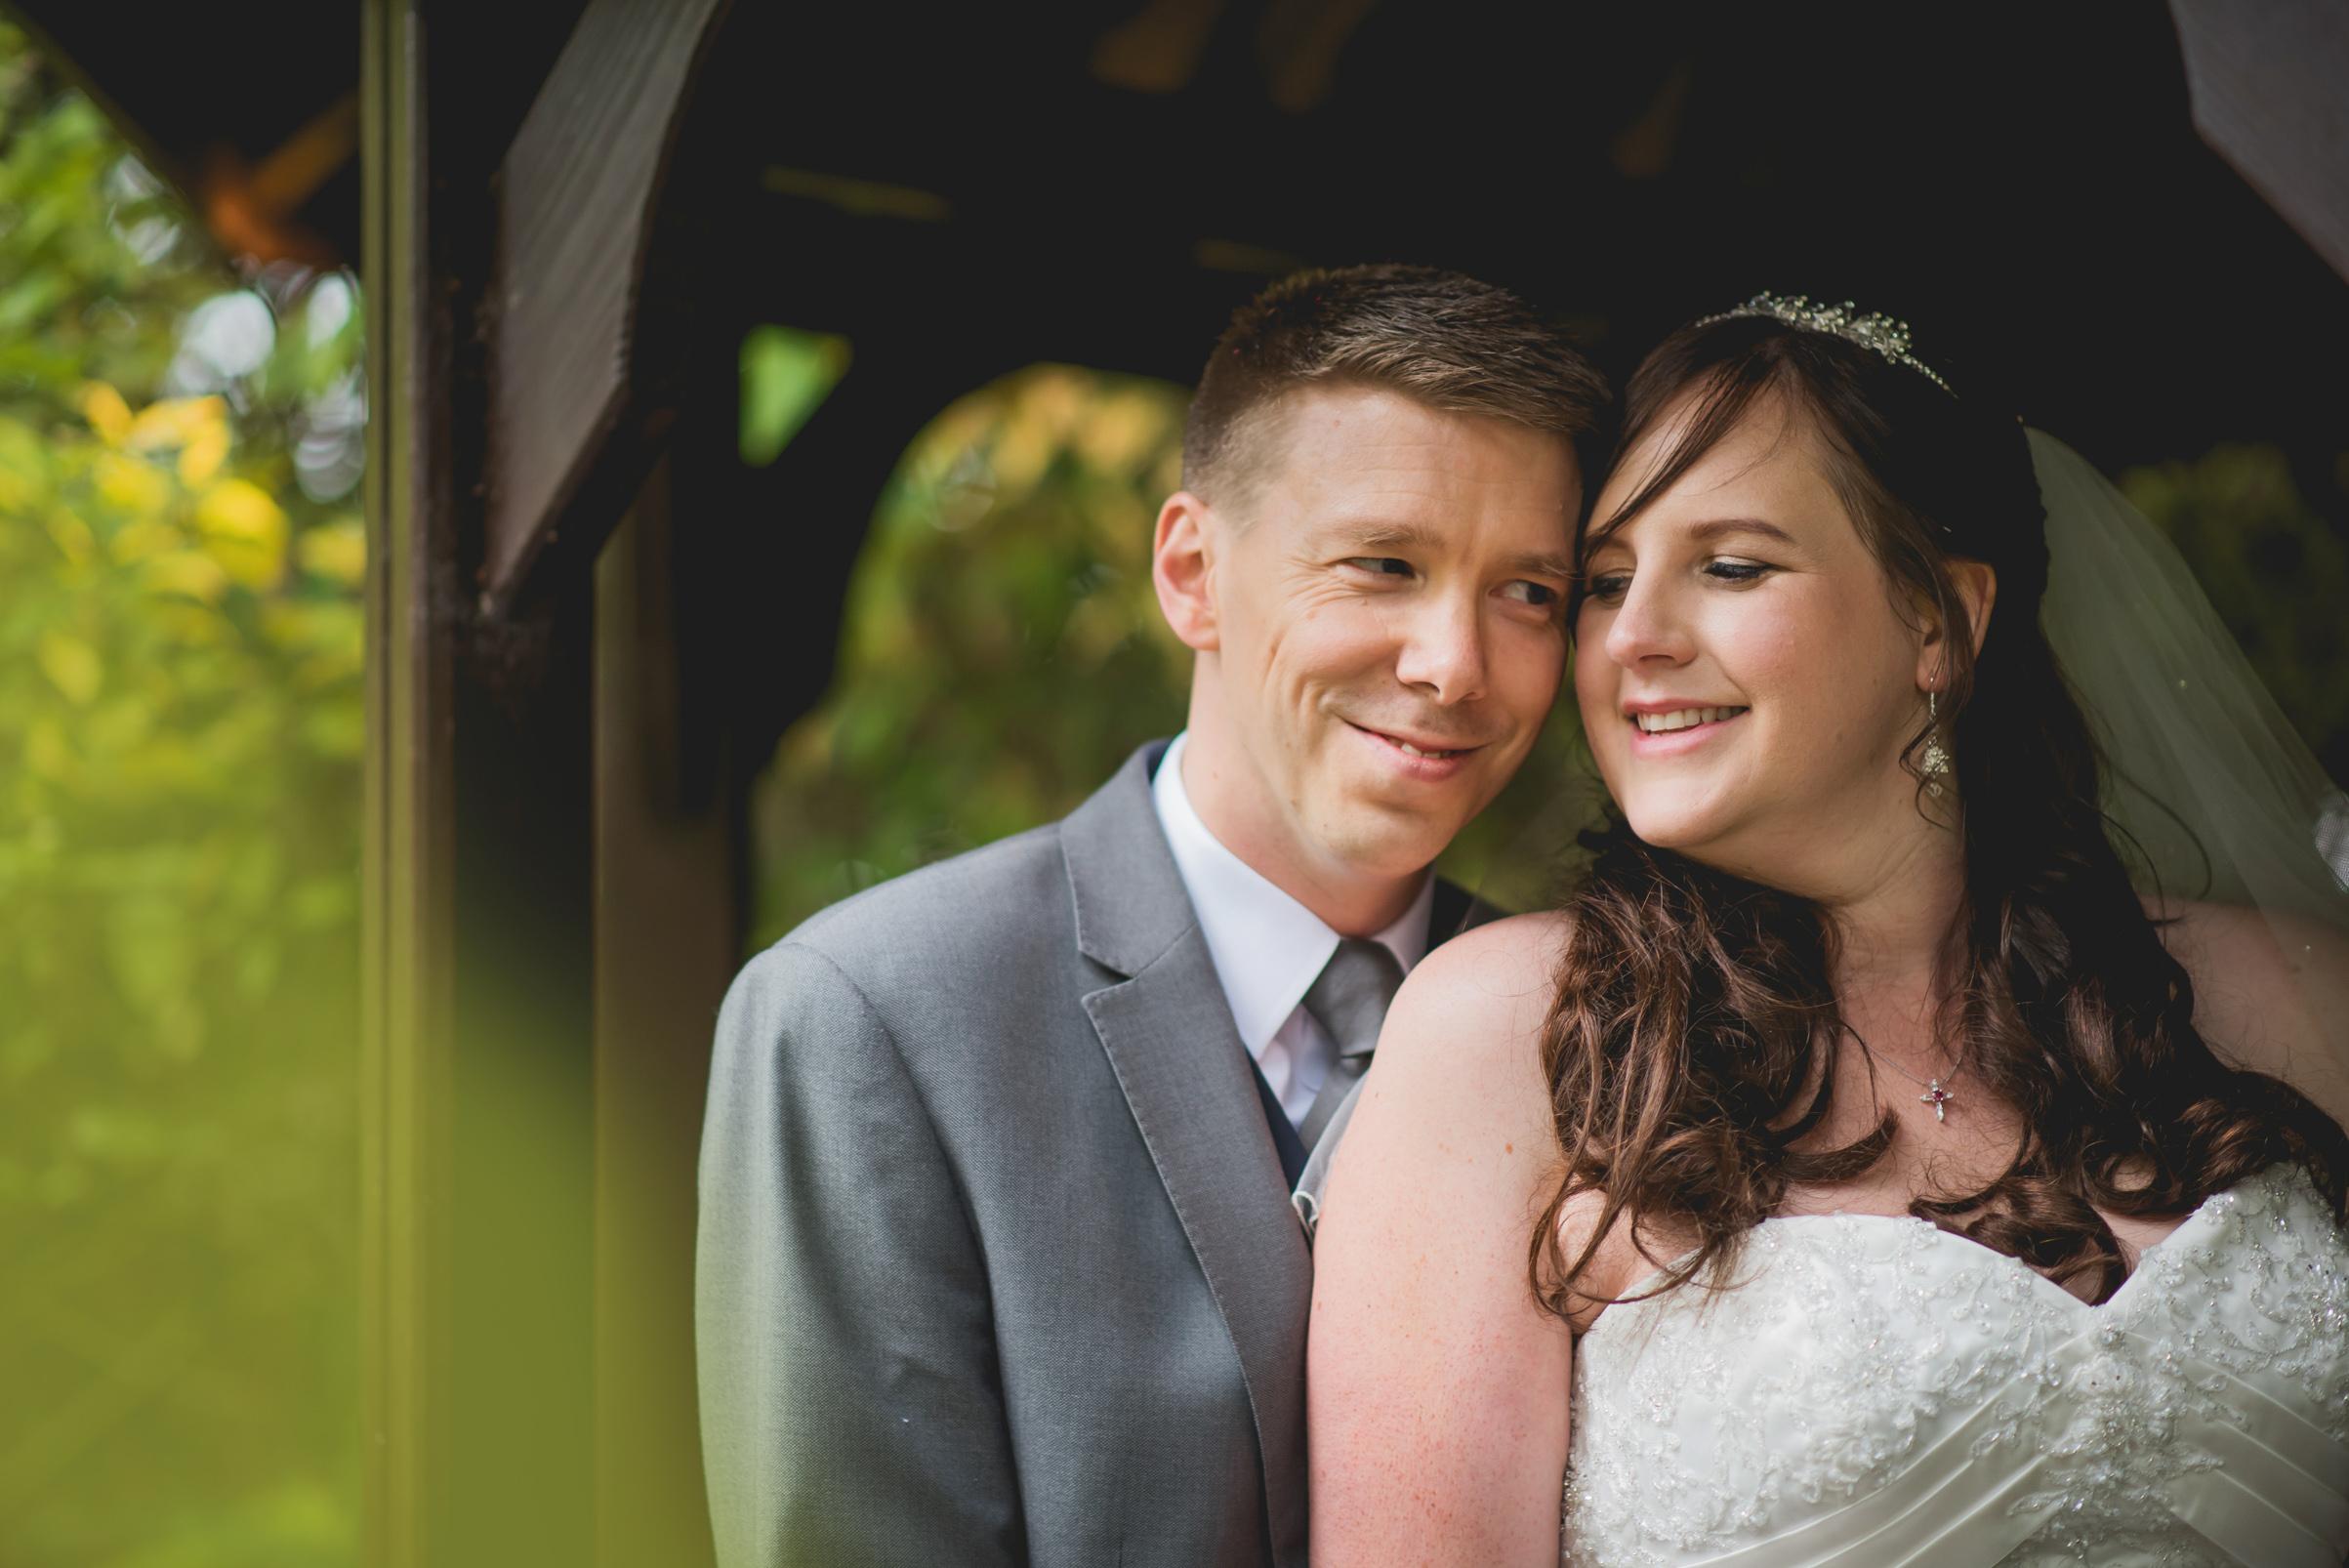 The+Fairlawns+wedding+Aldridge+StLukes+Church-163.jpg